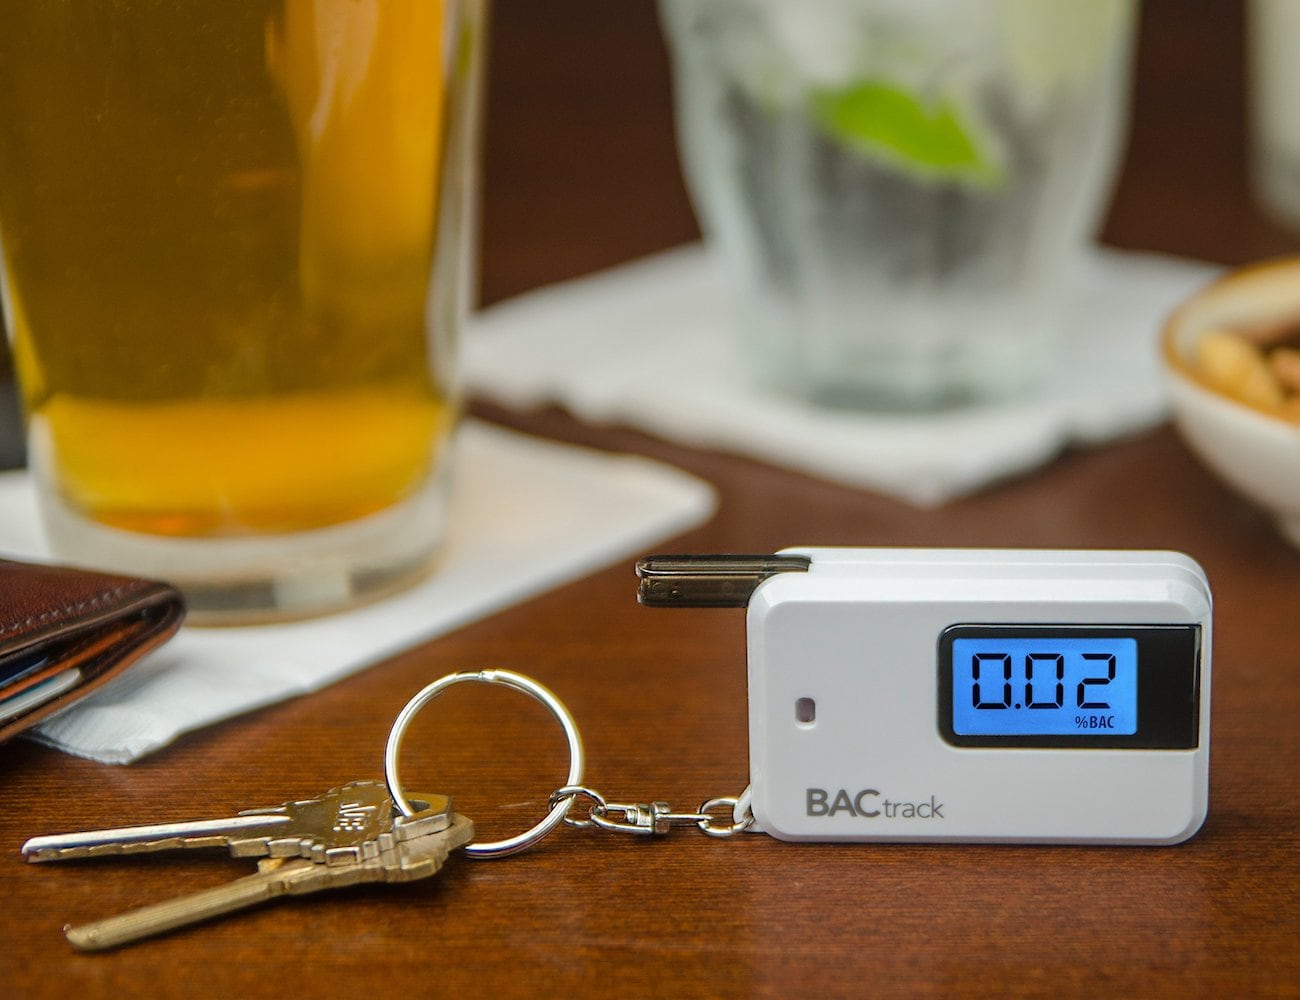 BACtrack Go Portable Keychain Breathalyzer